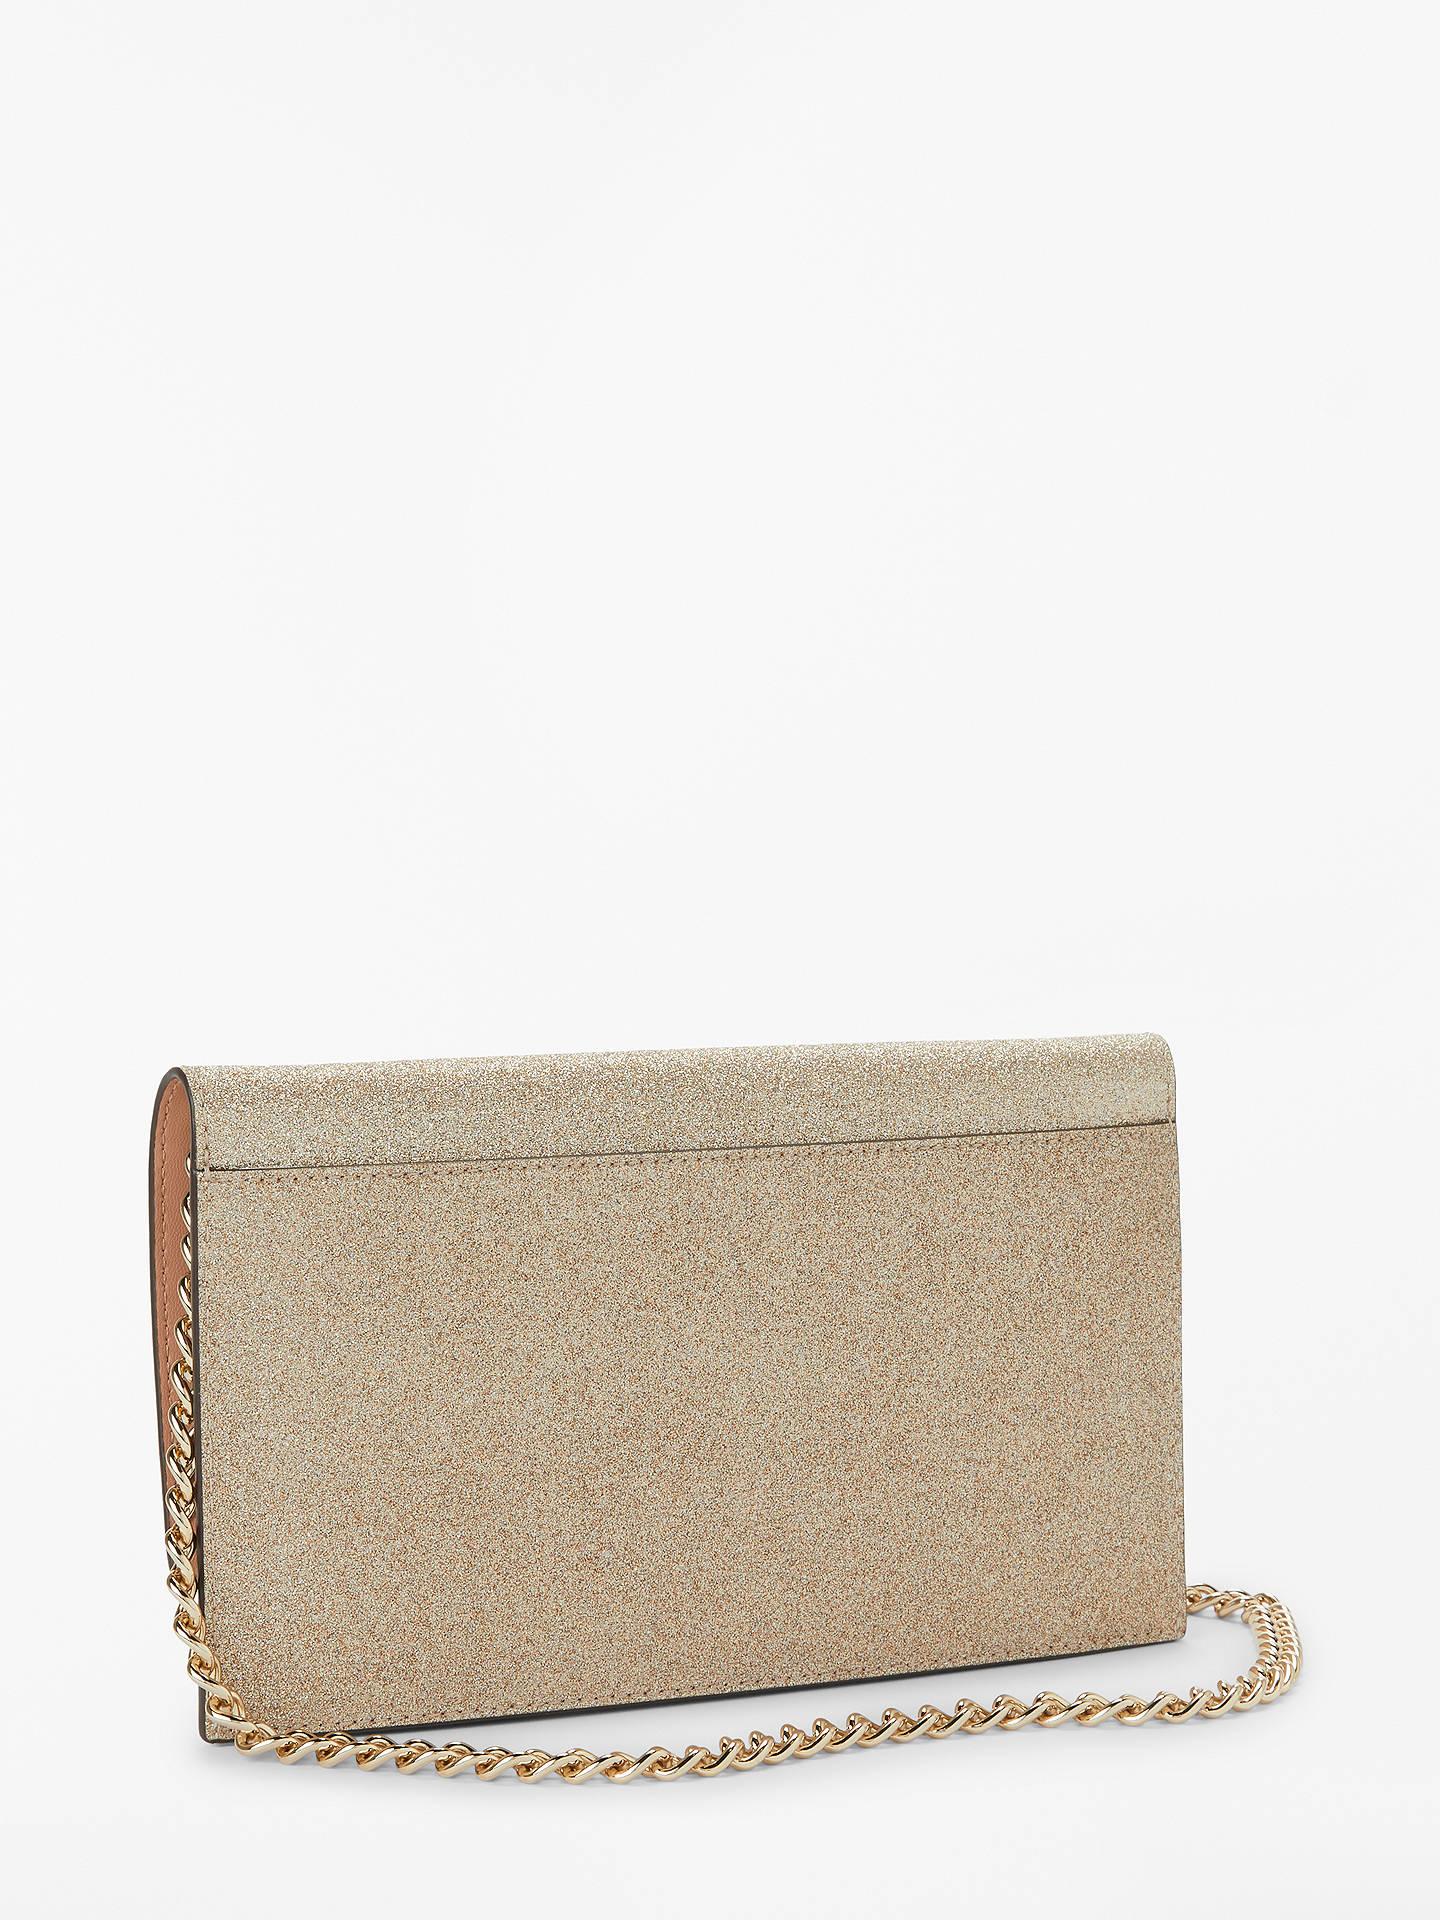 ccda8d2ed0 ... Buy kate spade new york Burgess Court Brennan Leather Foldover Purse